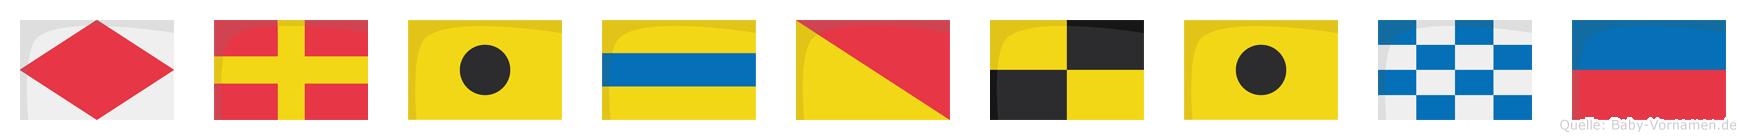 Fridoline im Flaggenalphabet